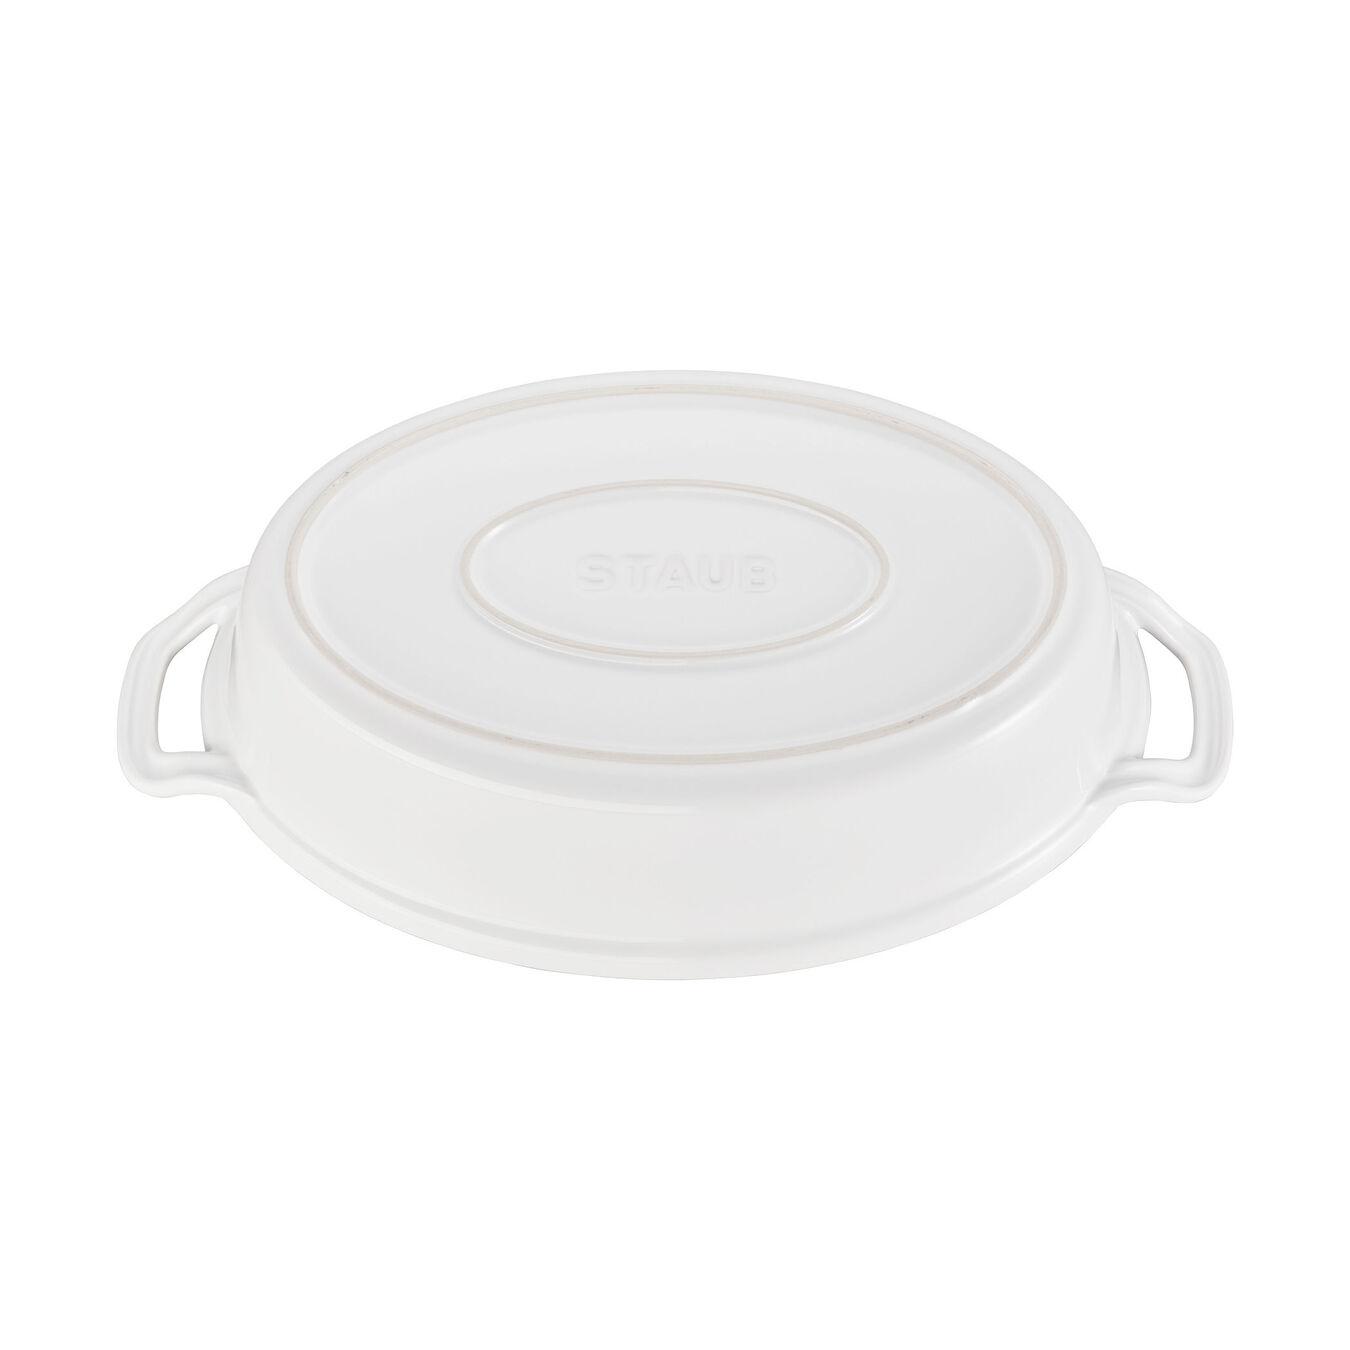 Ceramic Special shape bakeware, white,,large 3